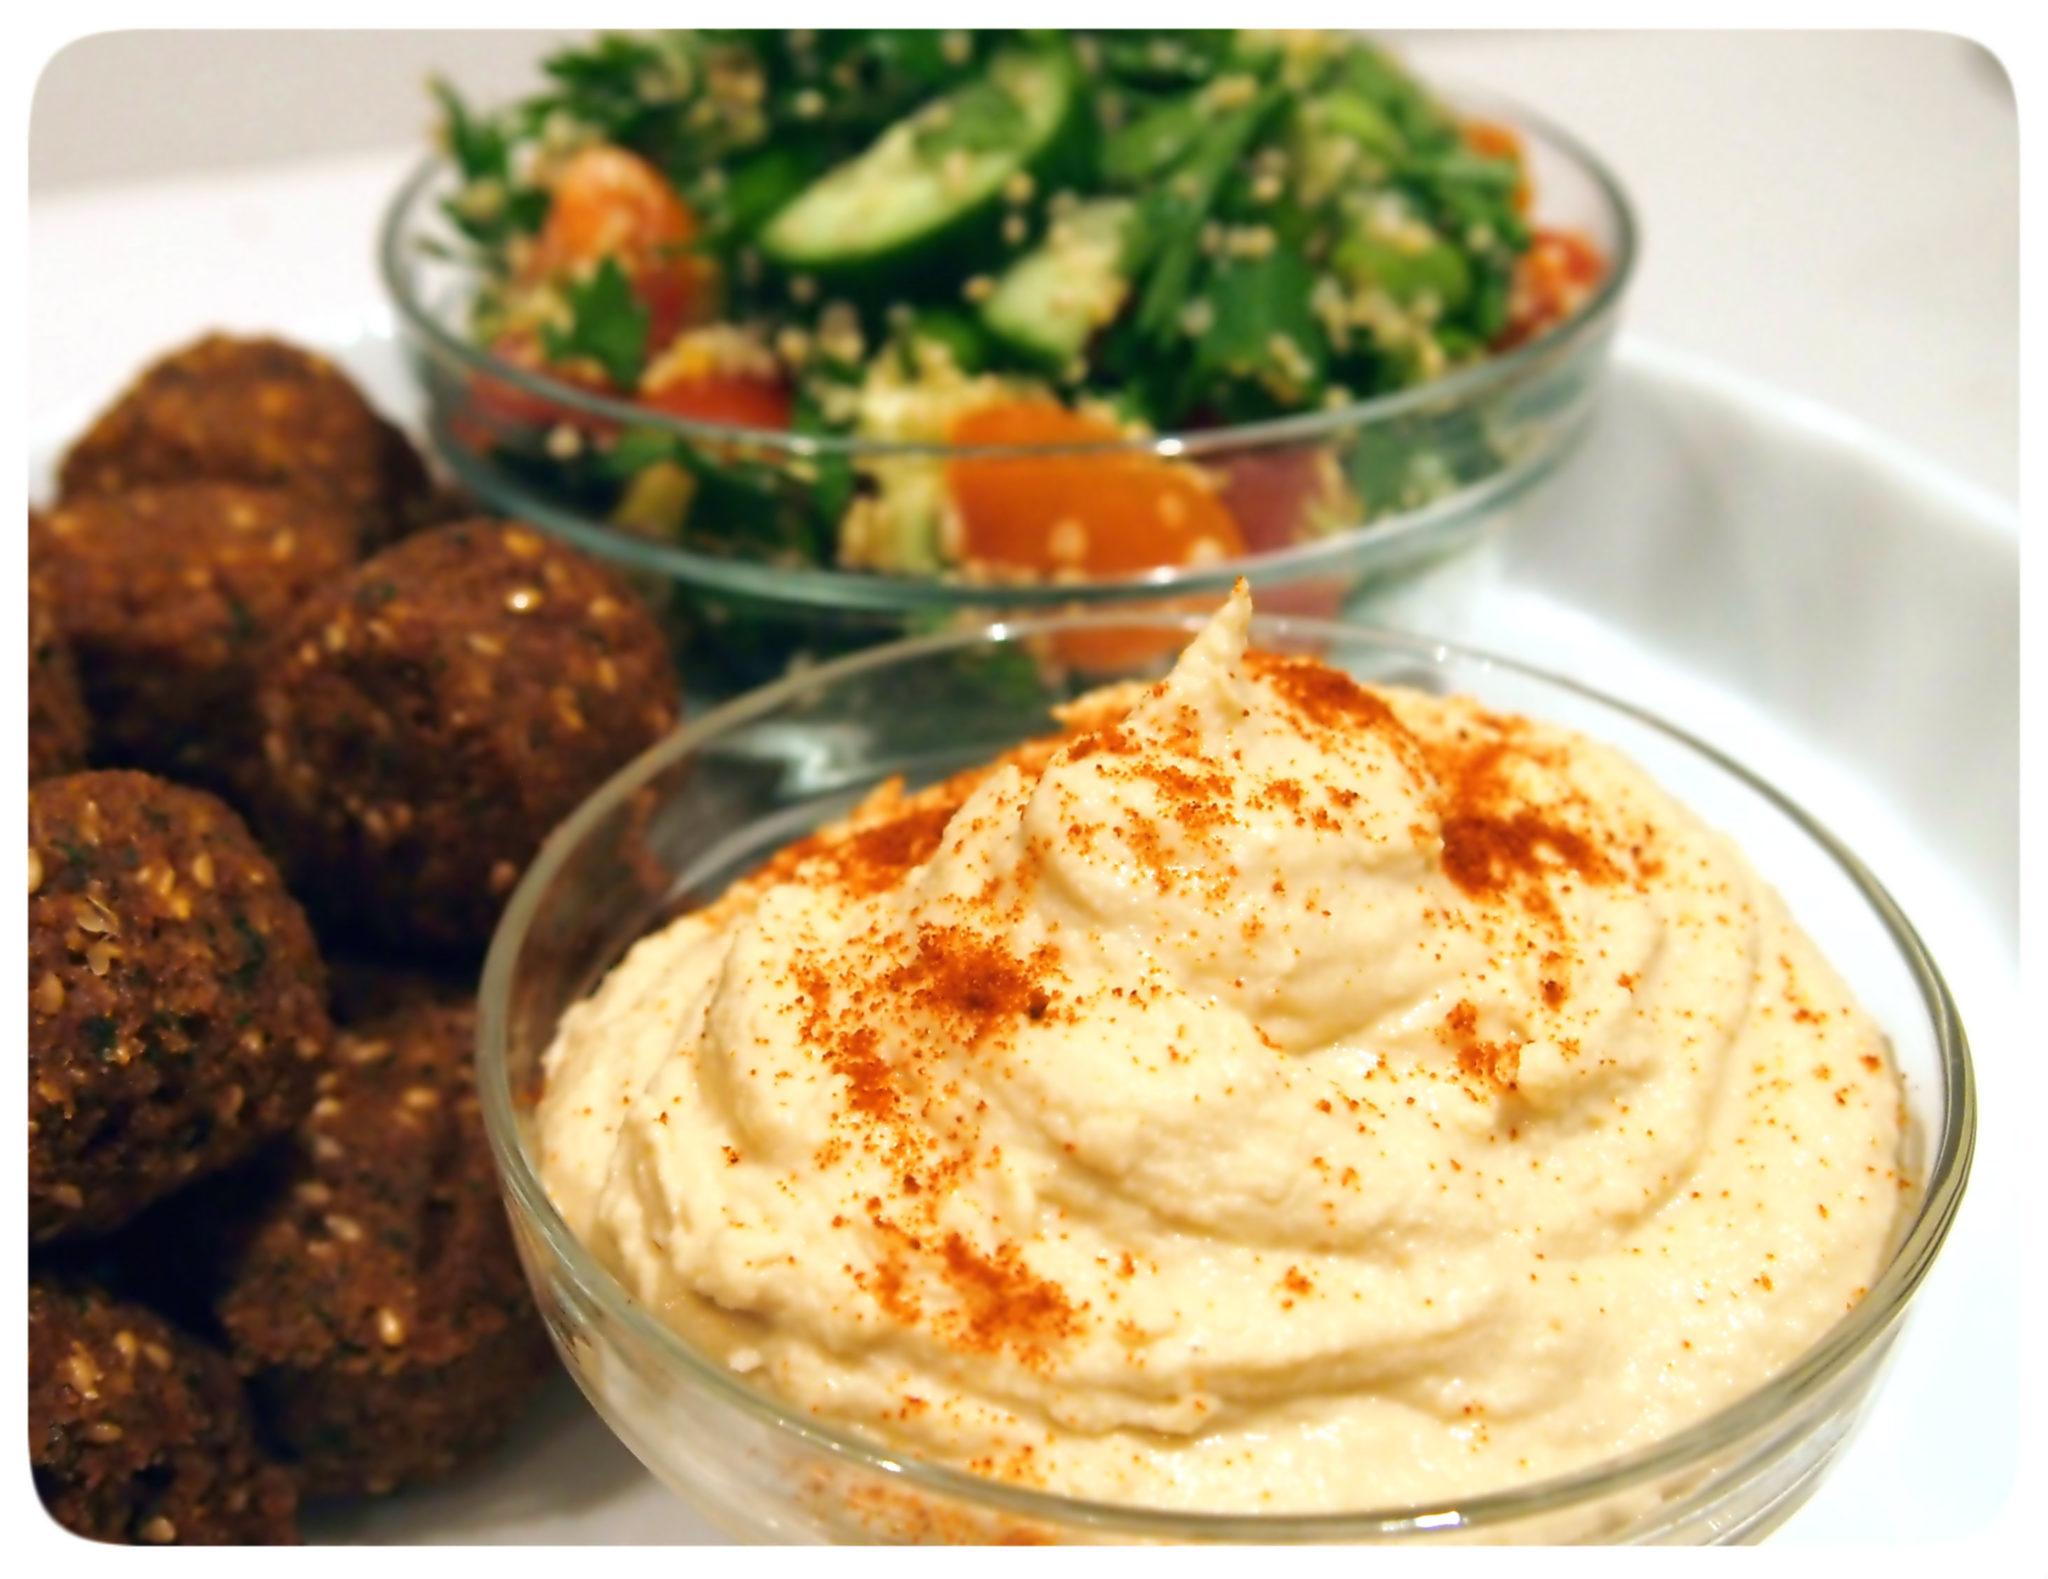 Egyptian Mezze Platter - Hummus and Quinoa Tabbouleh ...